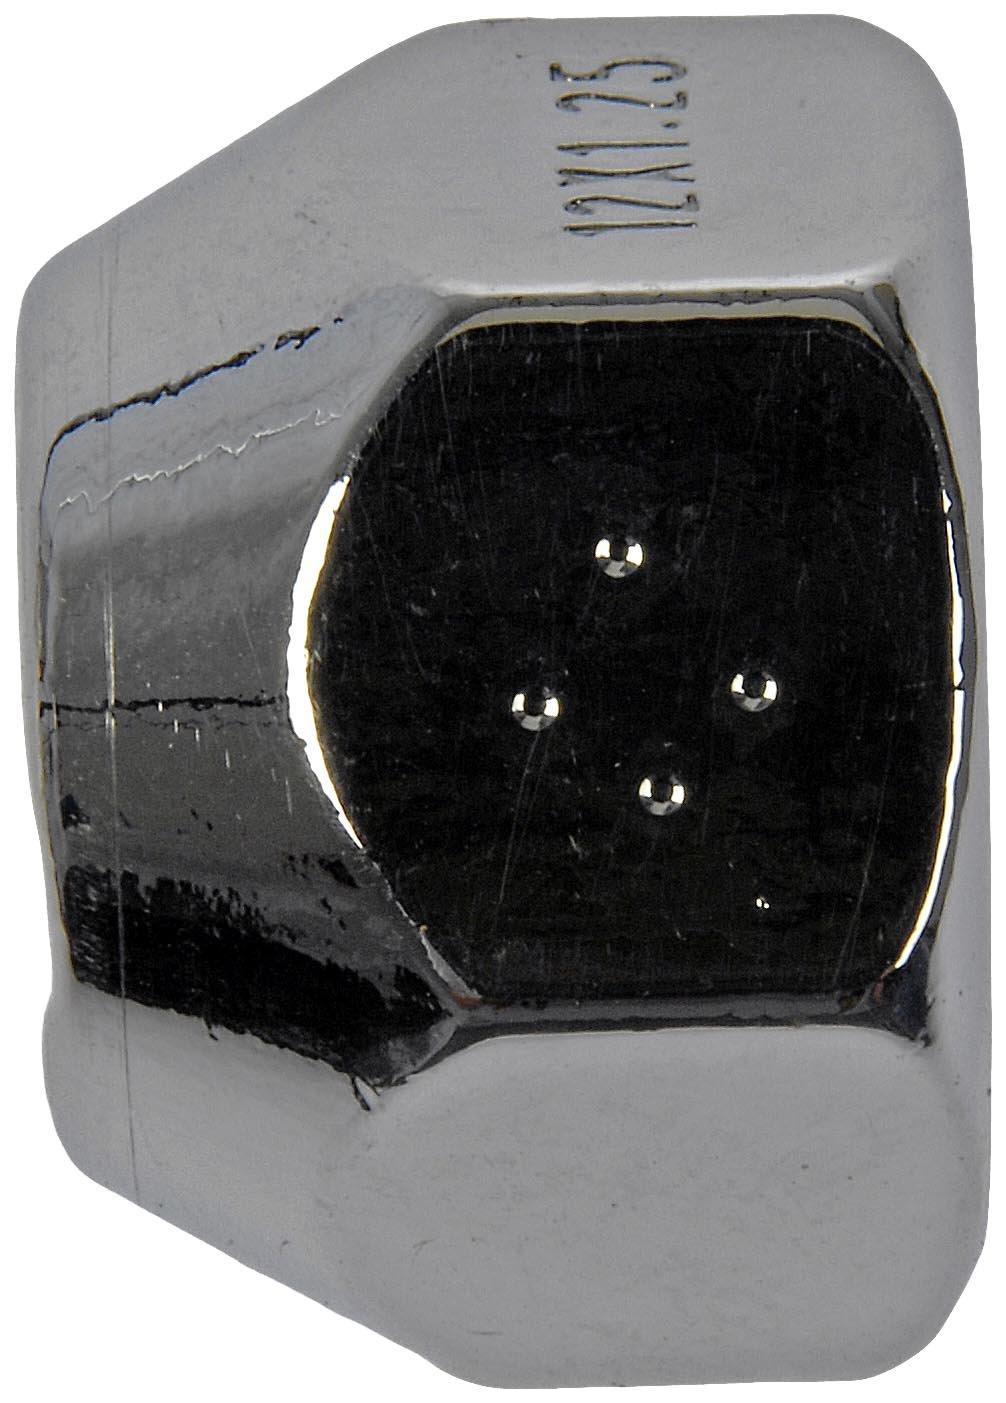 Dorman 21mm Hex and 27mm Long Wheel Nut 611-077.1